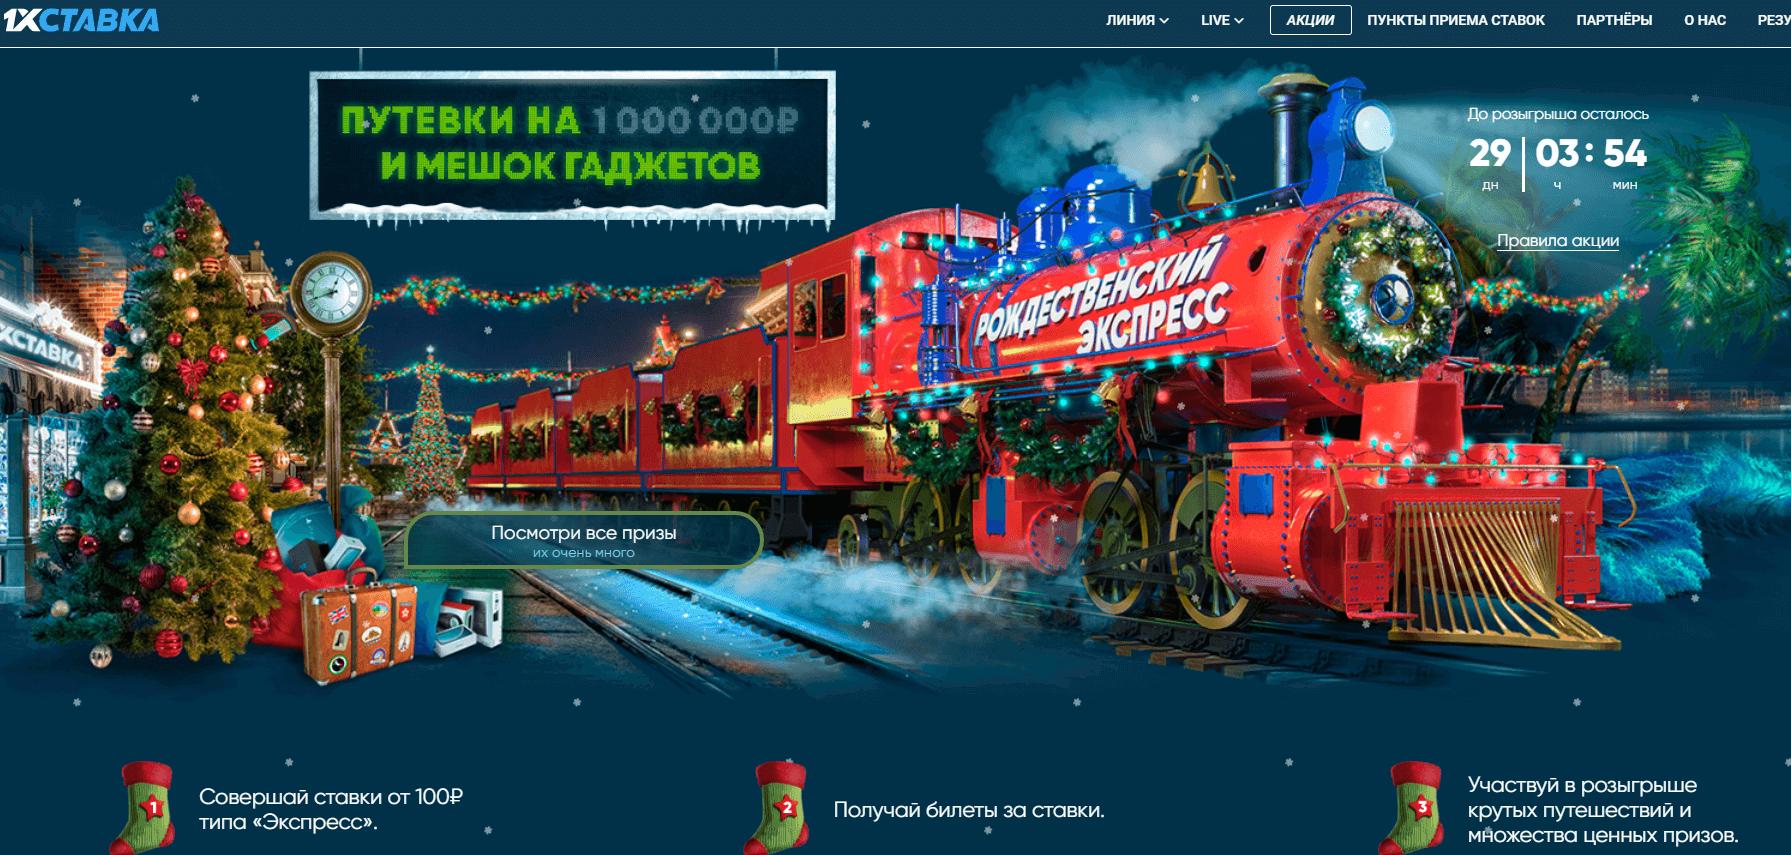 Условия акции Рождественский экспресс 1хставка.ру